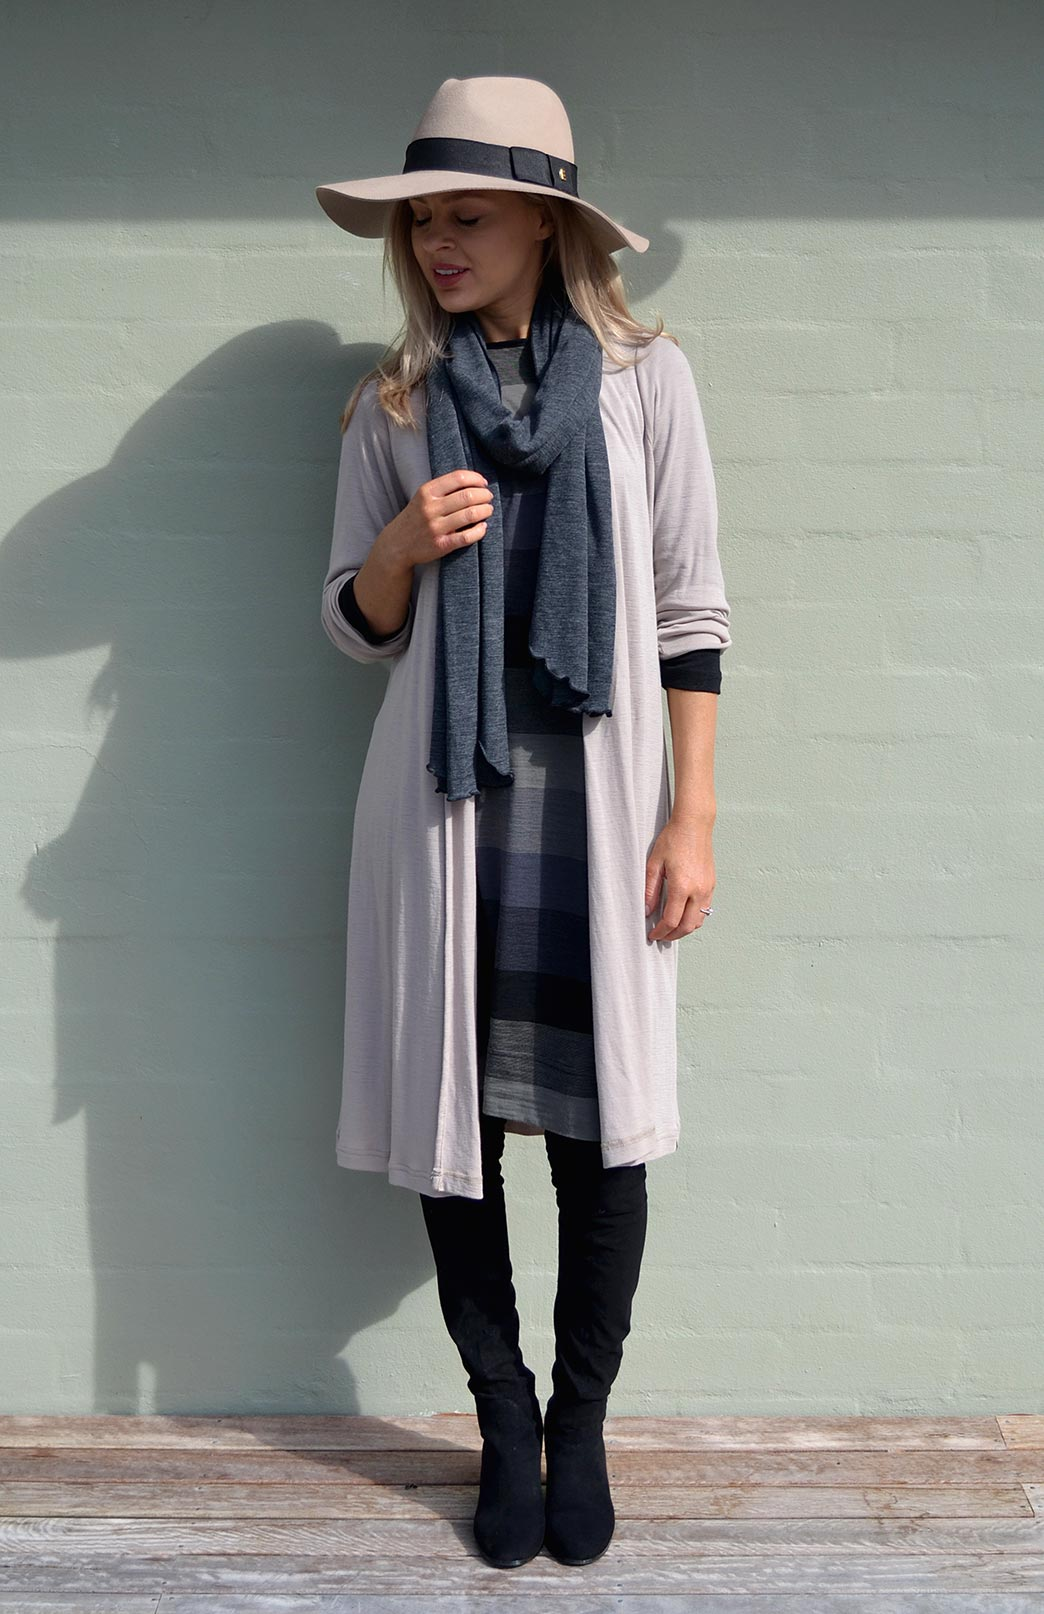 Long Drape Cardigan - Smitten Merino Tasmania Australia